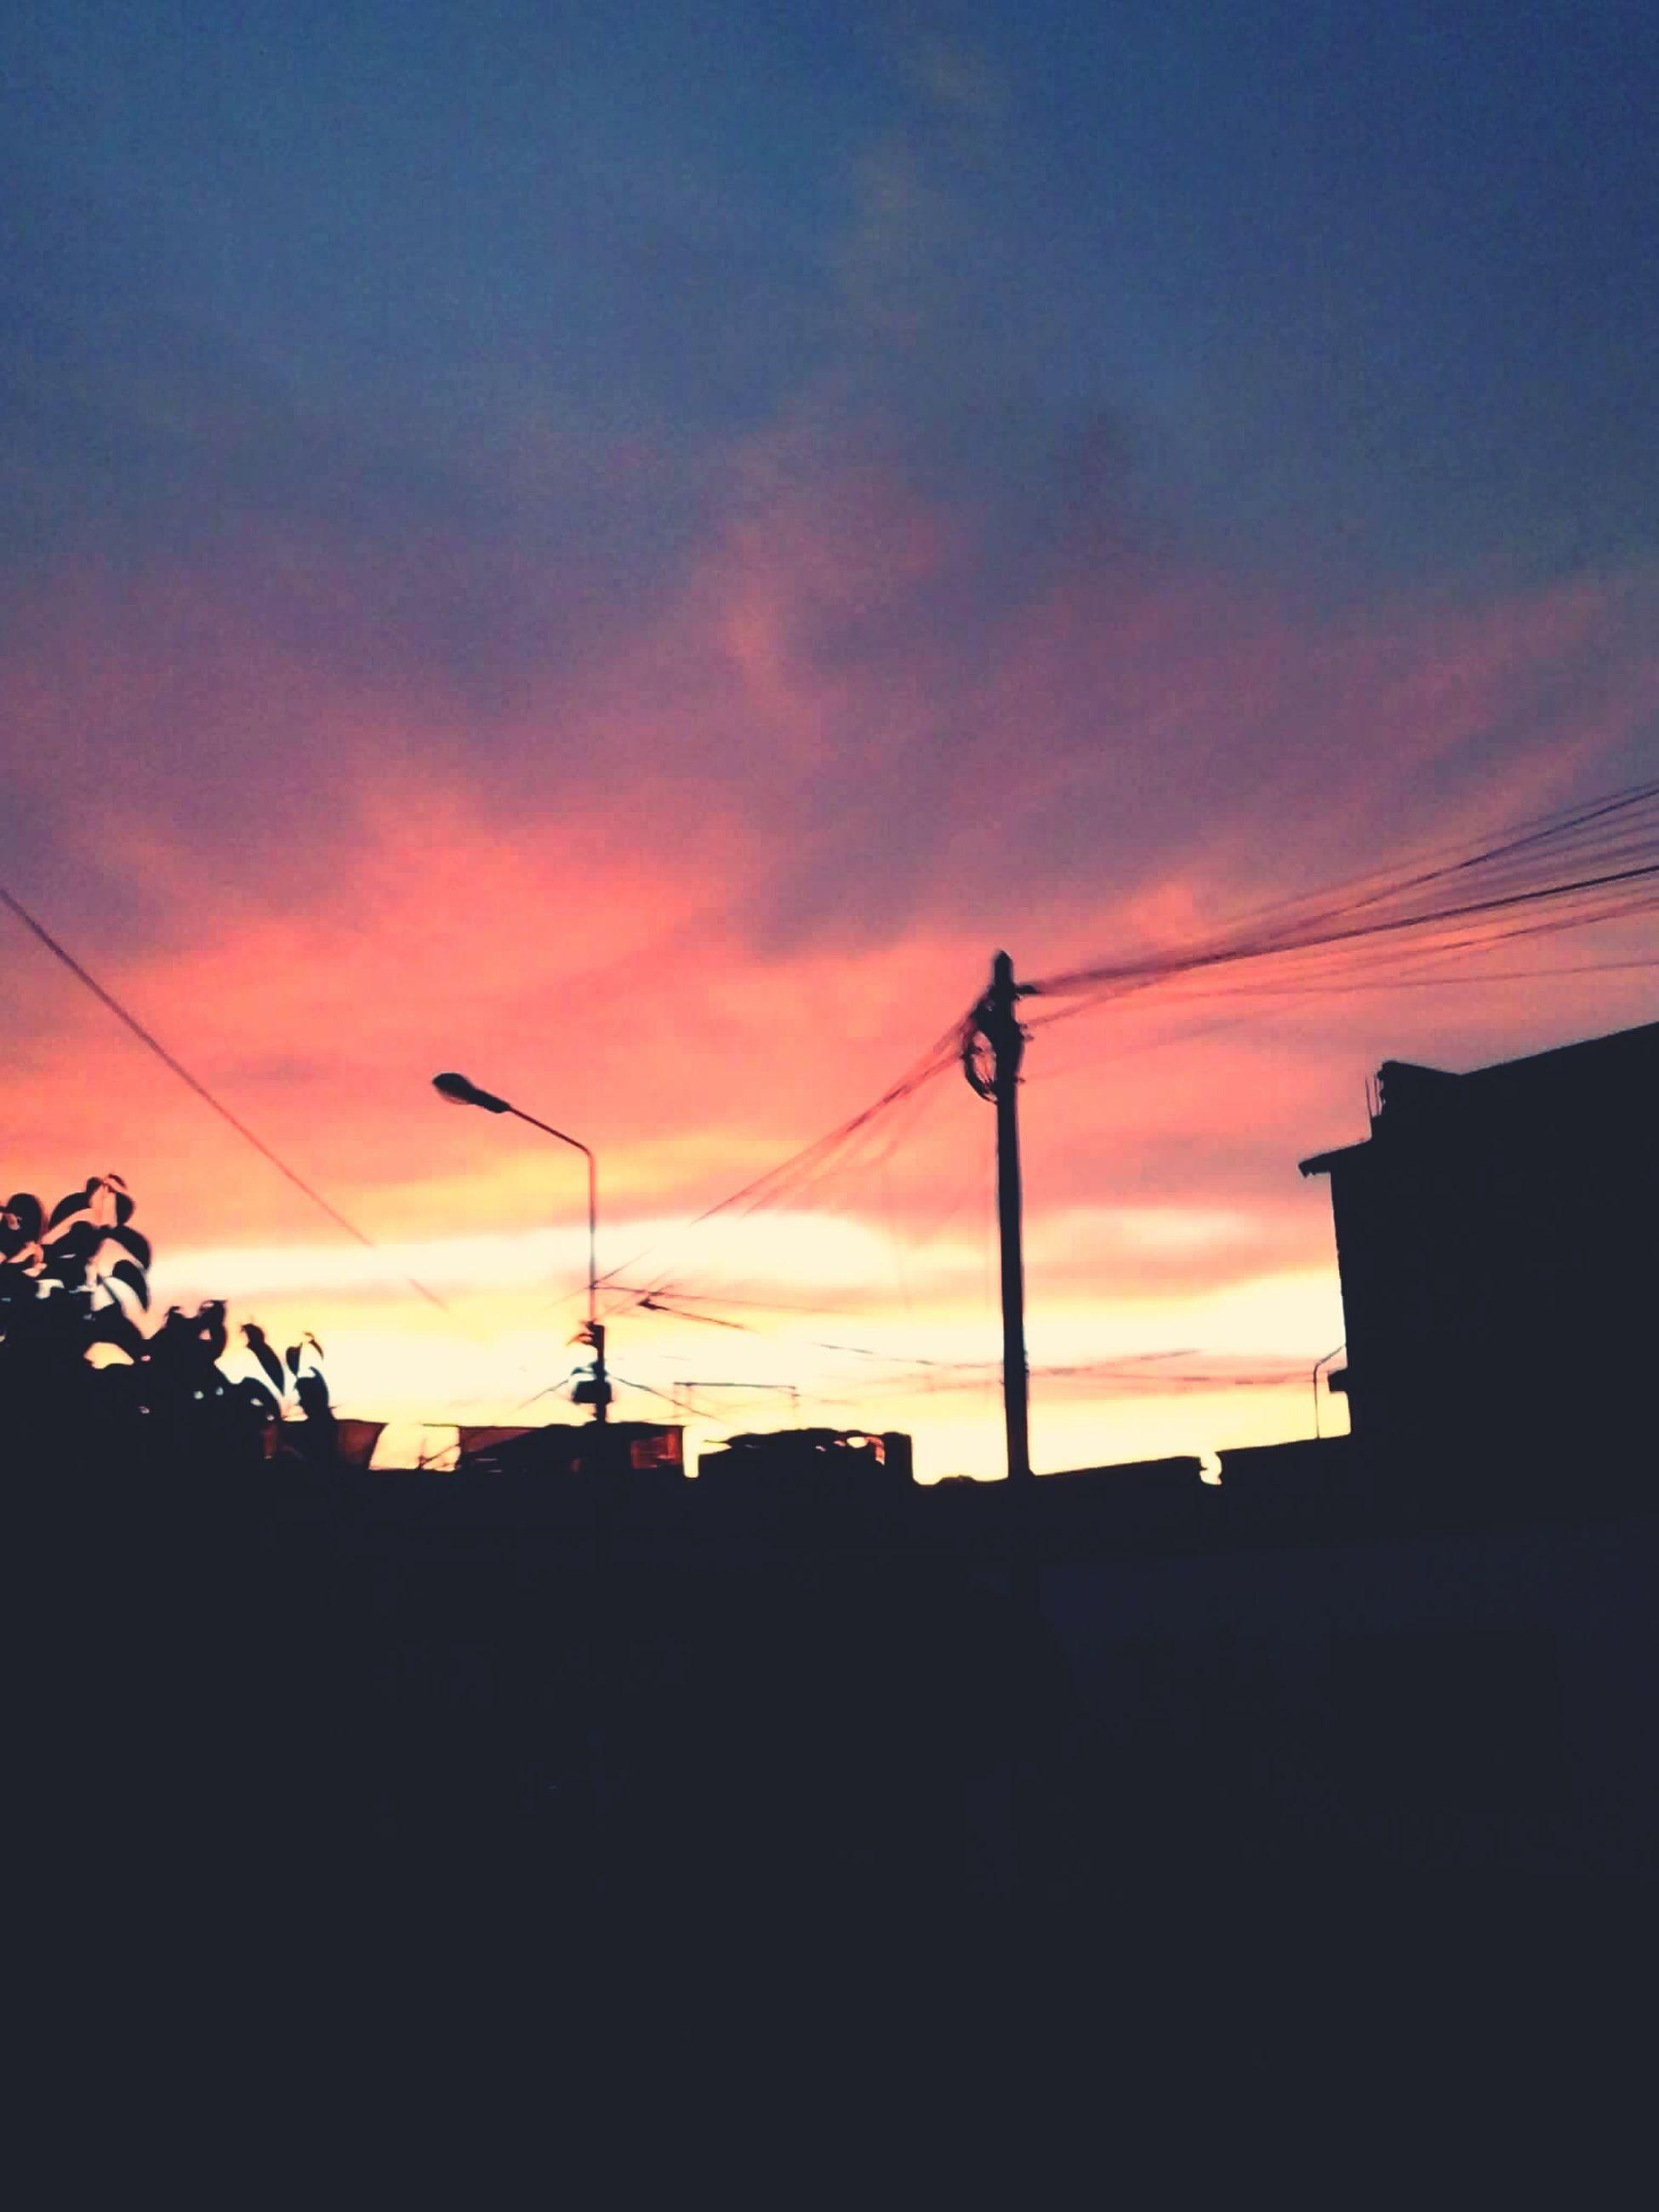 sunset, silhouette, building exterior, architecture, built structure, sky, orange color, low angle view, cloud - sky, street light, power line, house, building, cloud, residential structure, city, dusk, dark, residential building, dramatic sky